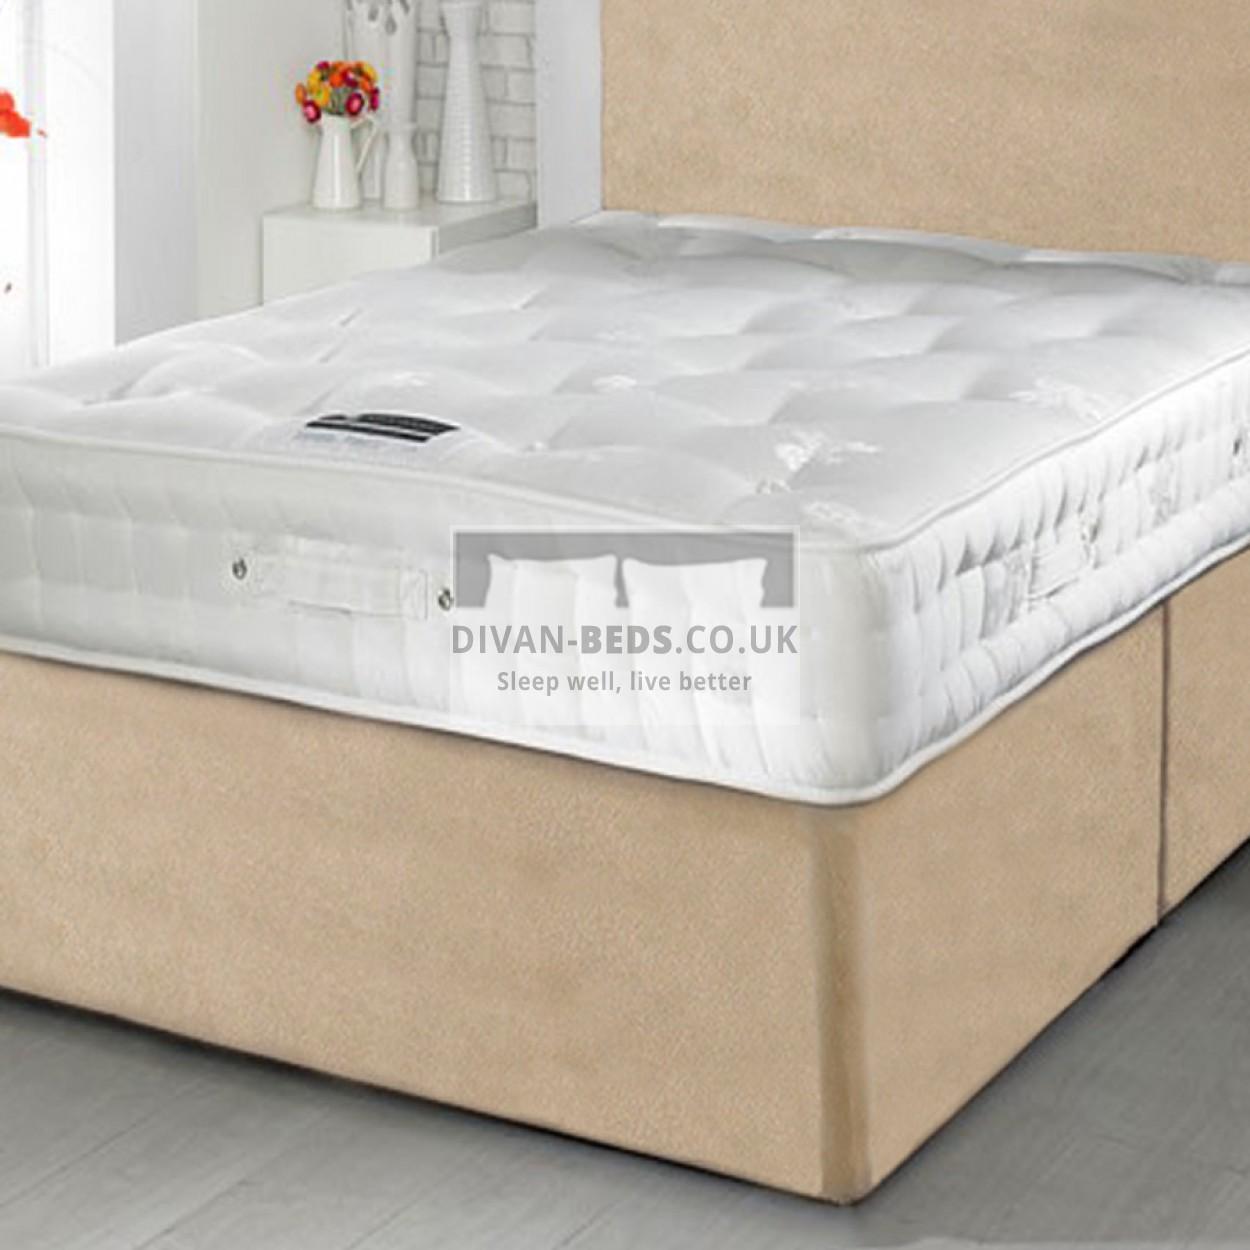 Rupert divan bed with 1500 pocket spring memory foam for Memory foam divan